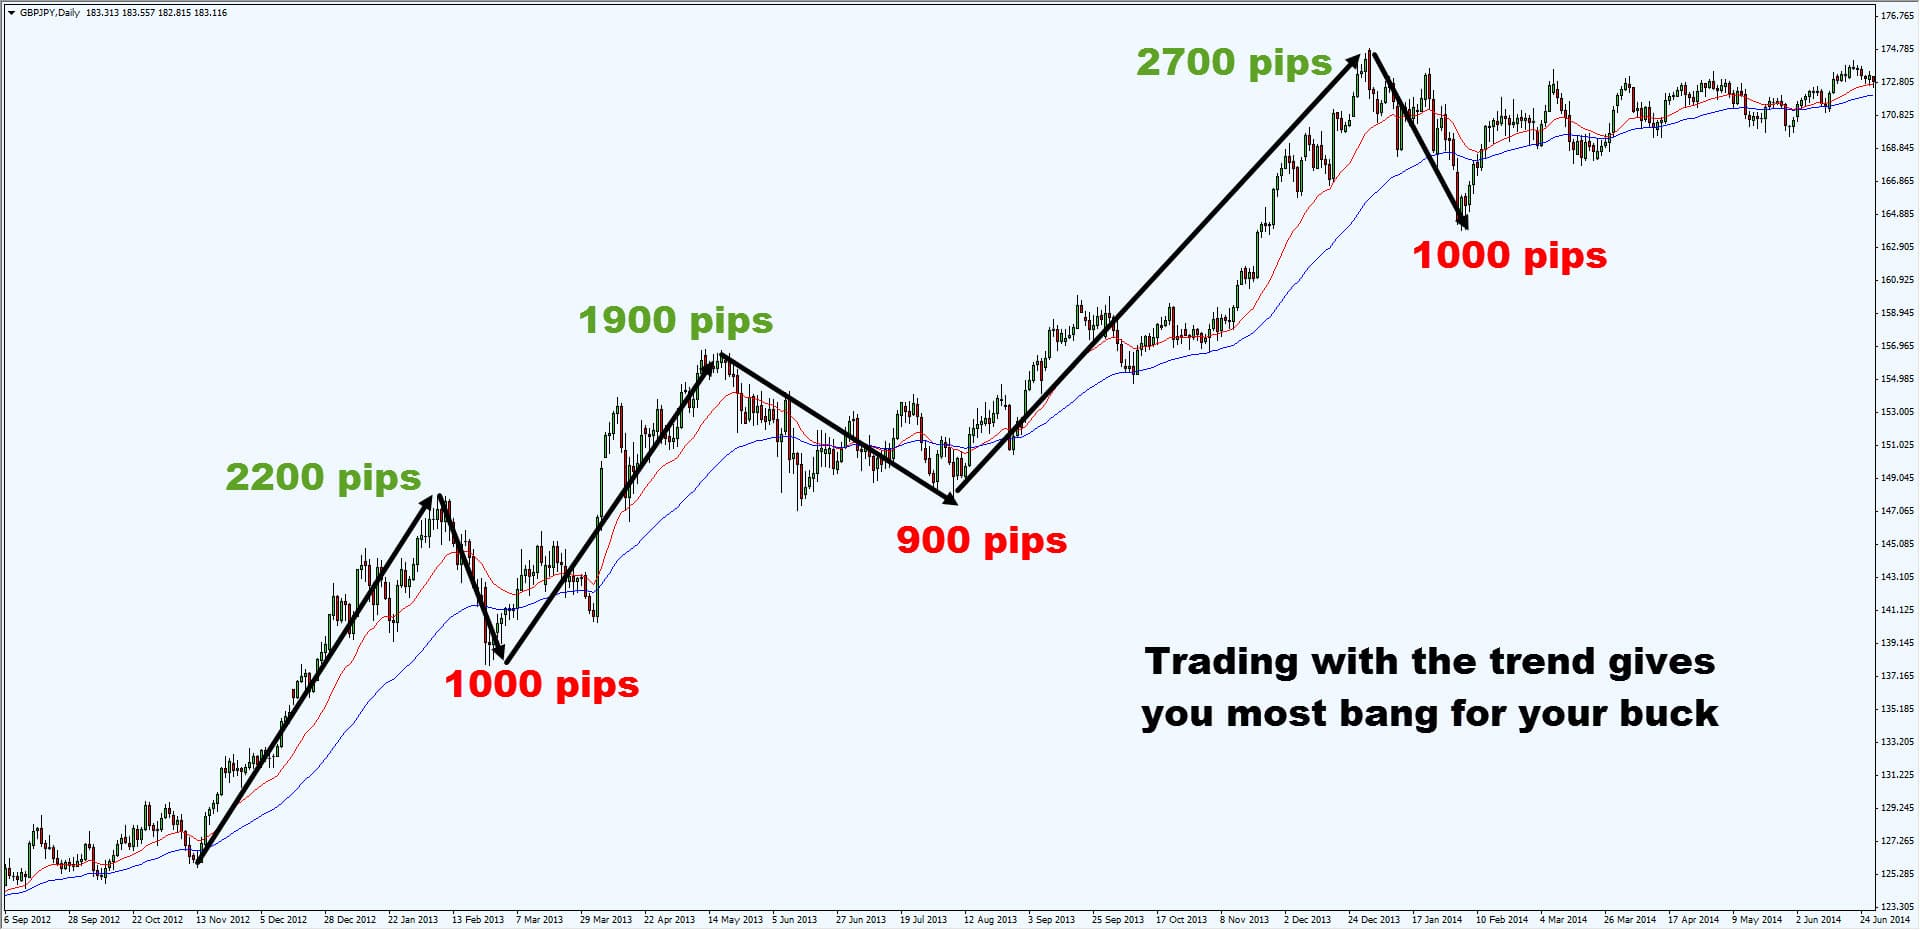 Turtle trading strategy 2 long range